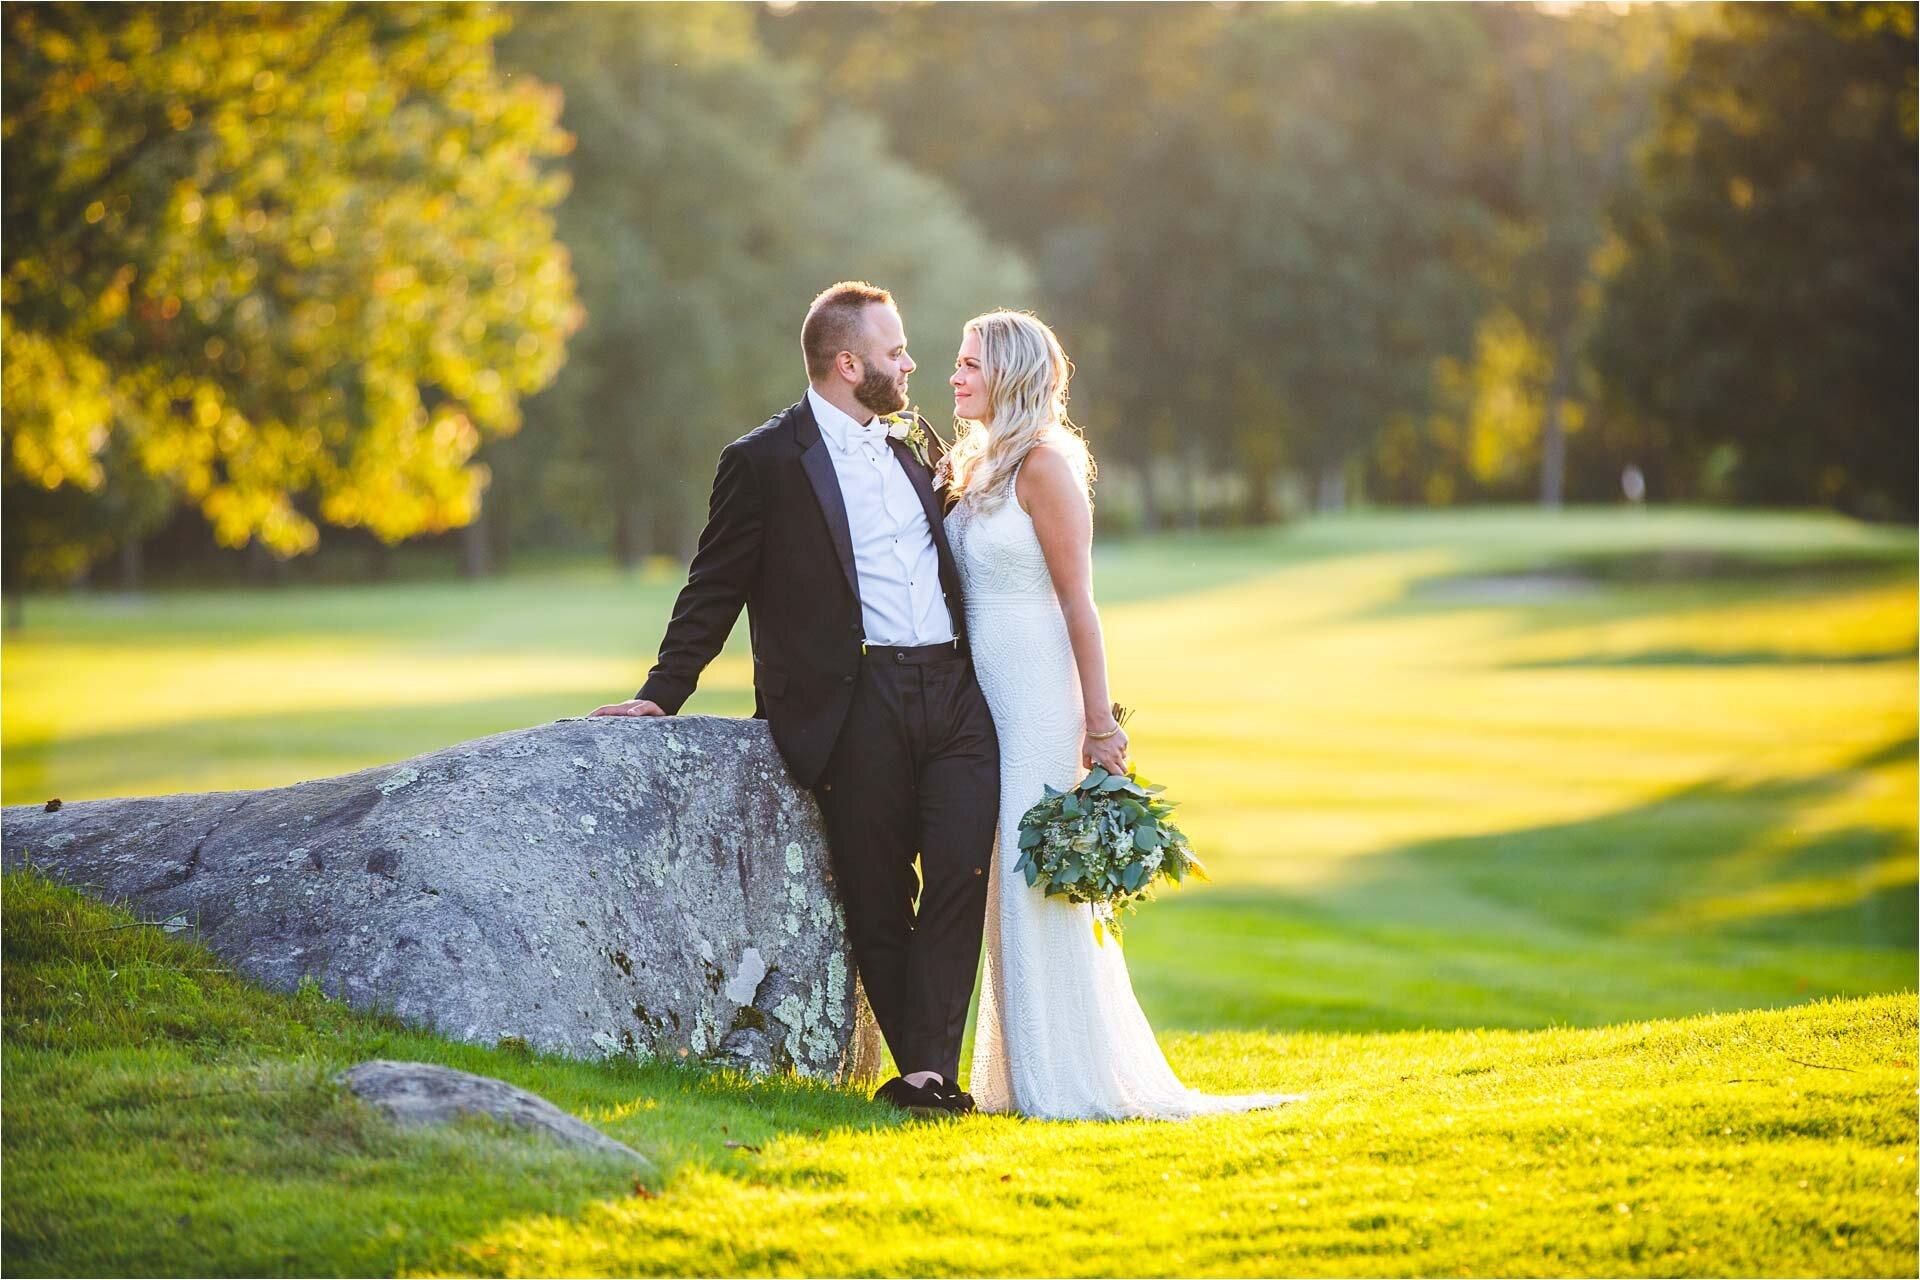 racebrook-countryclub-wedding-photography-01.jpg